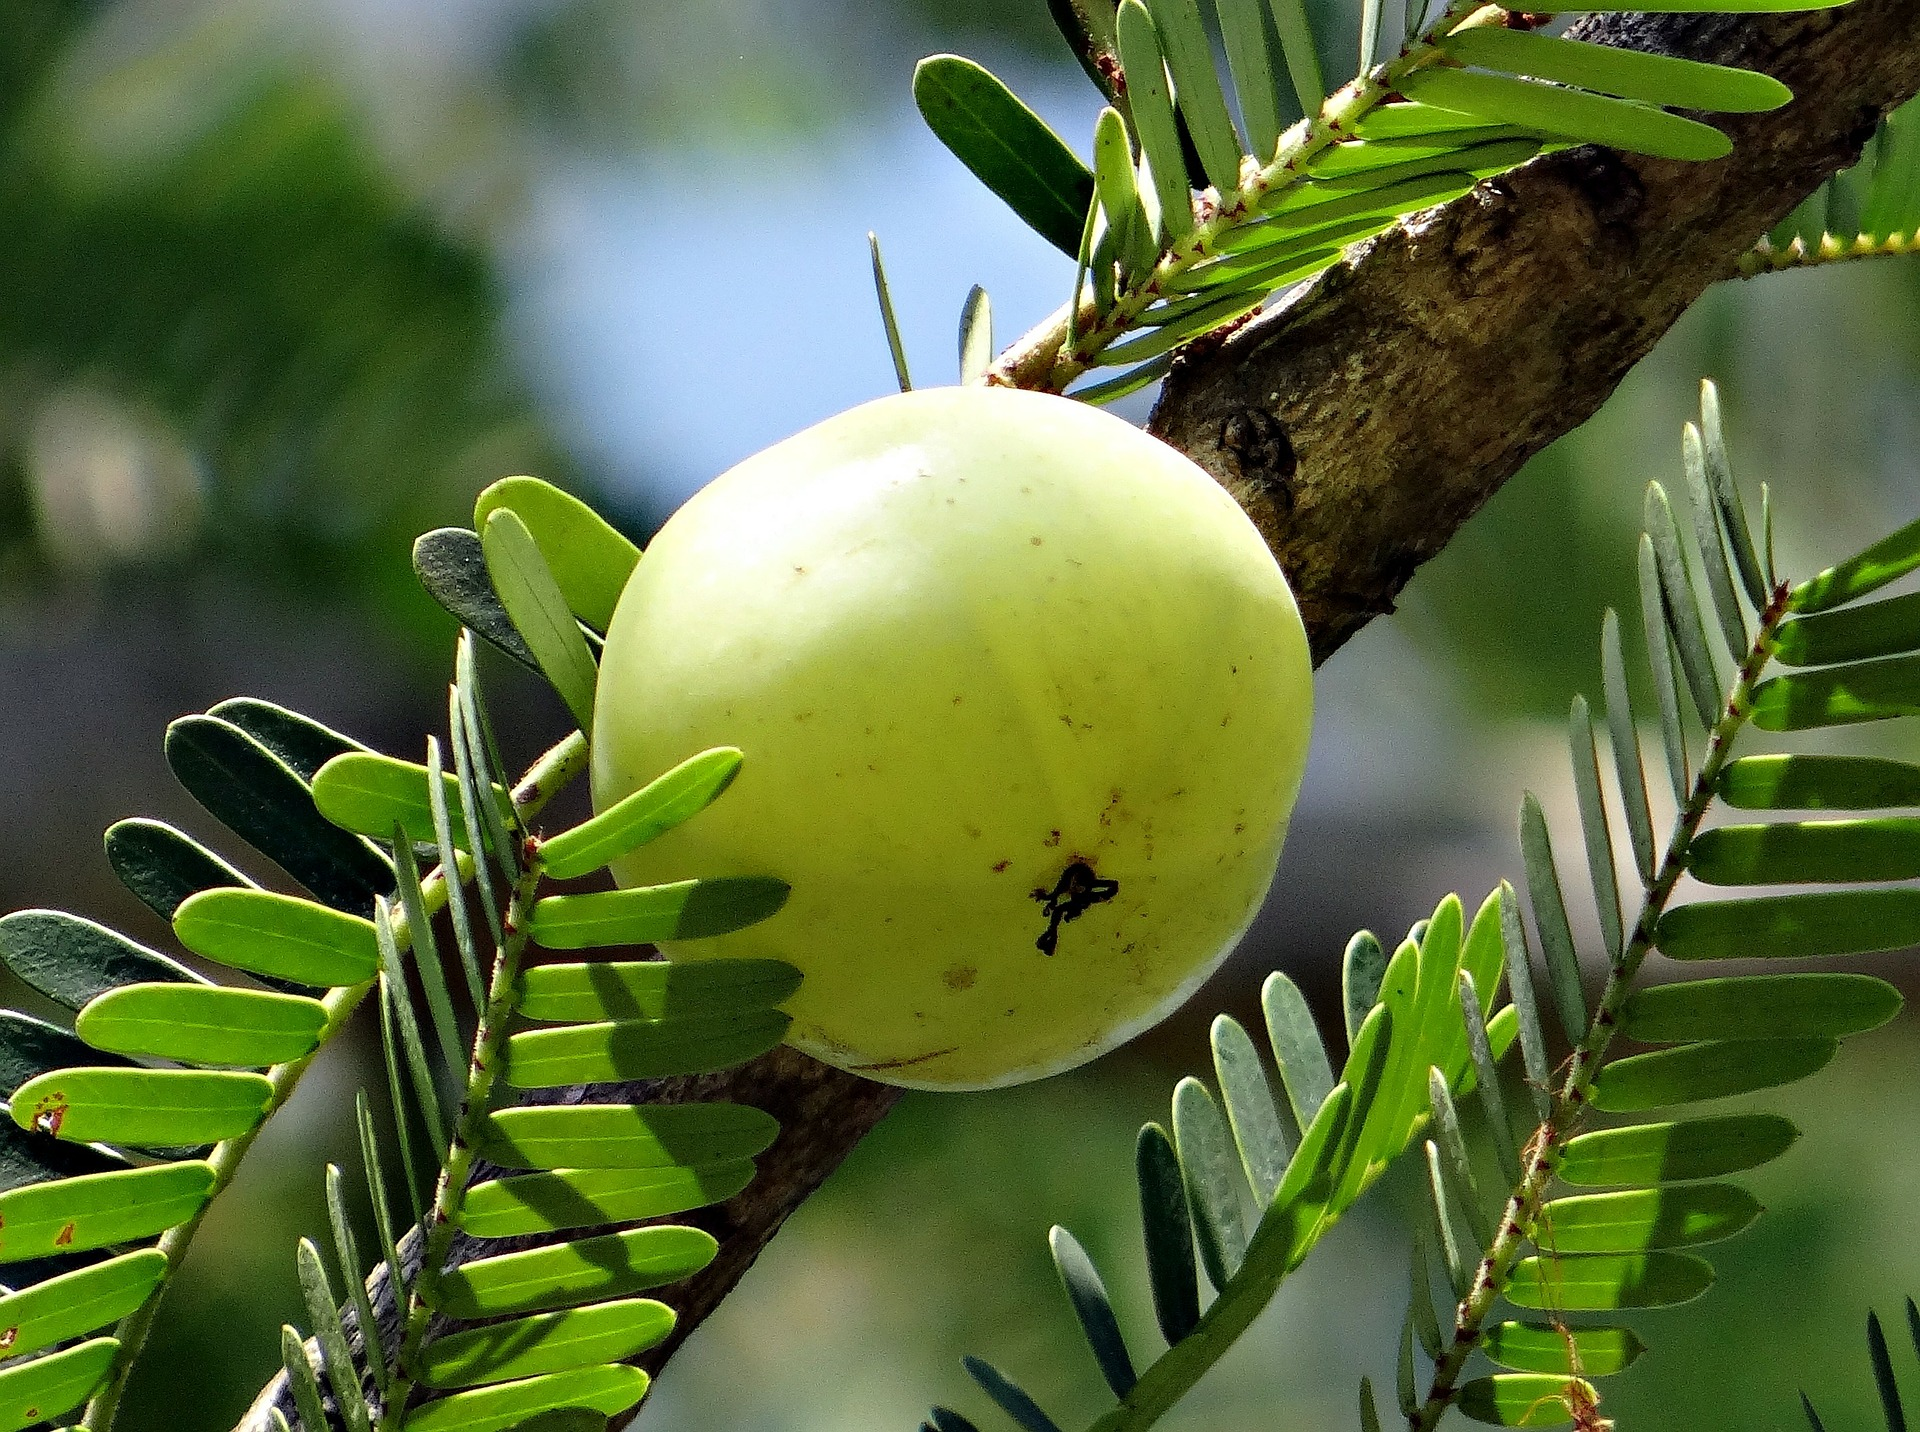 Top 10 superfoods - Amla/Indian Gooseberry